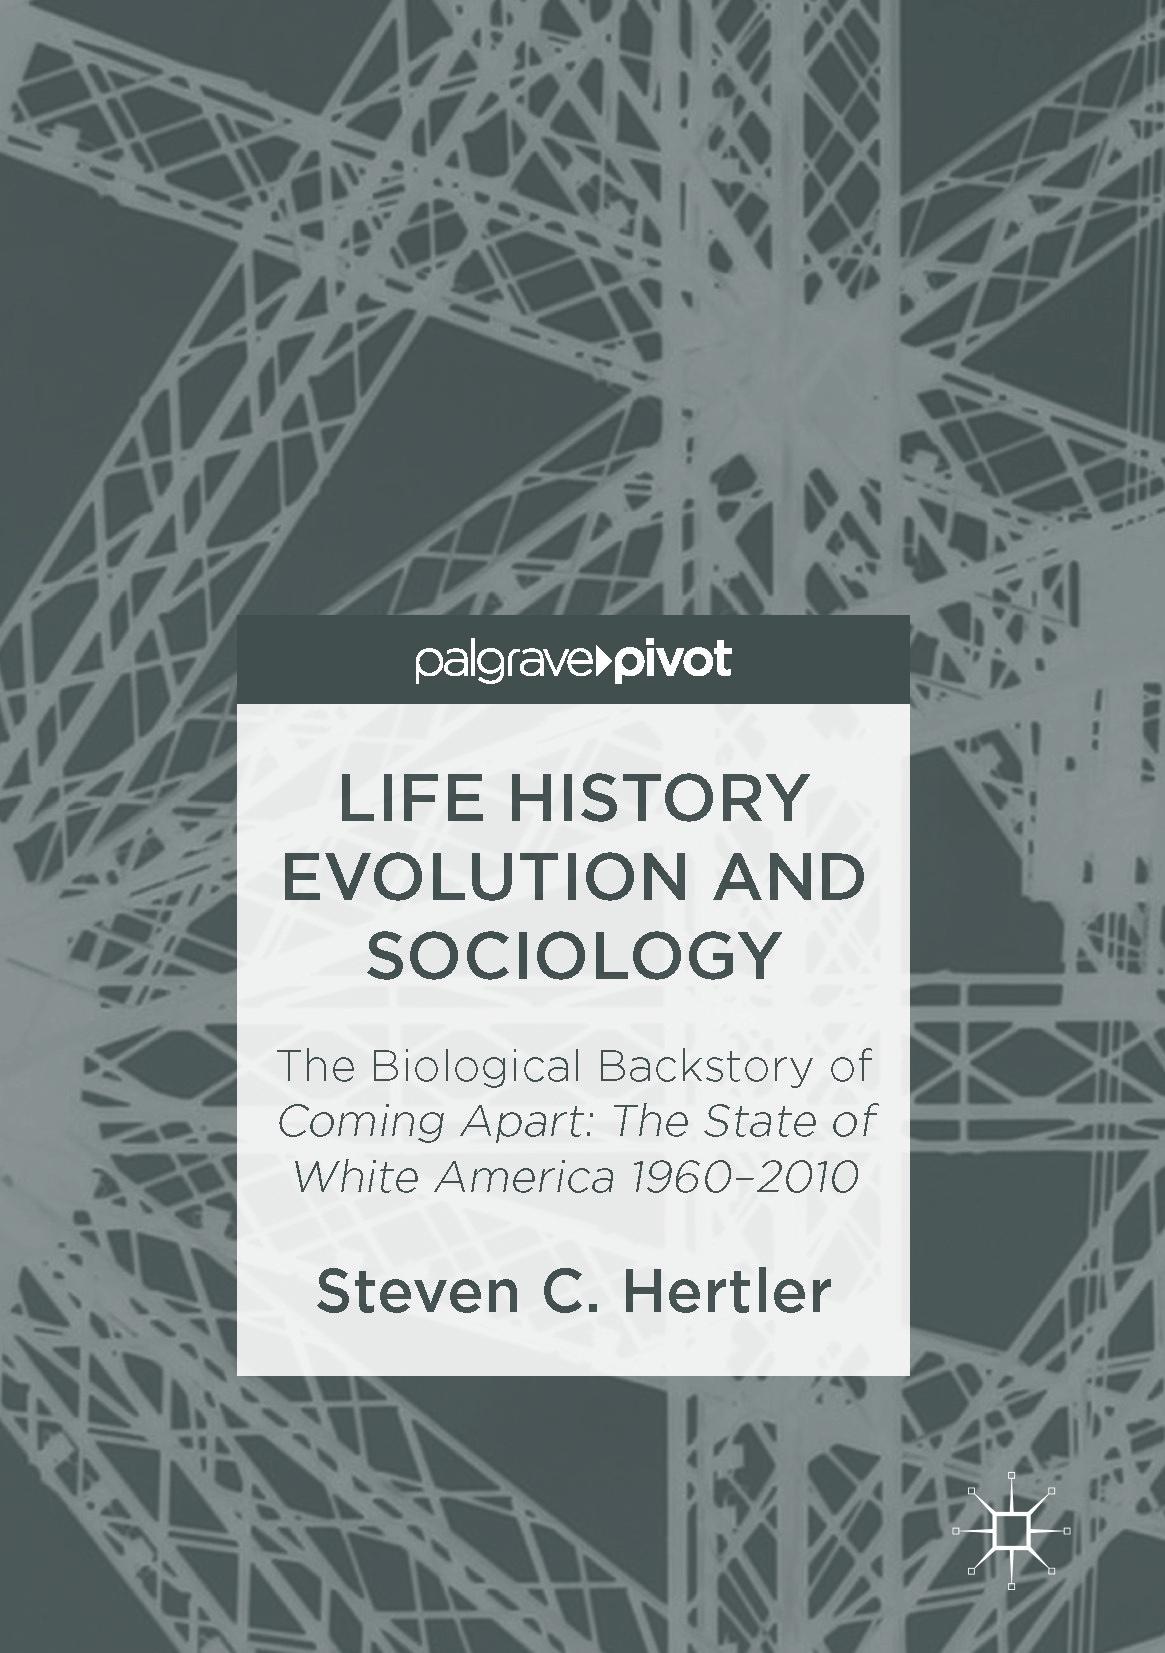 Hertler, Steven C. - Life History Evolution and Sociology, ebook